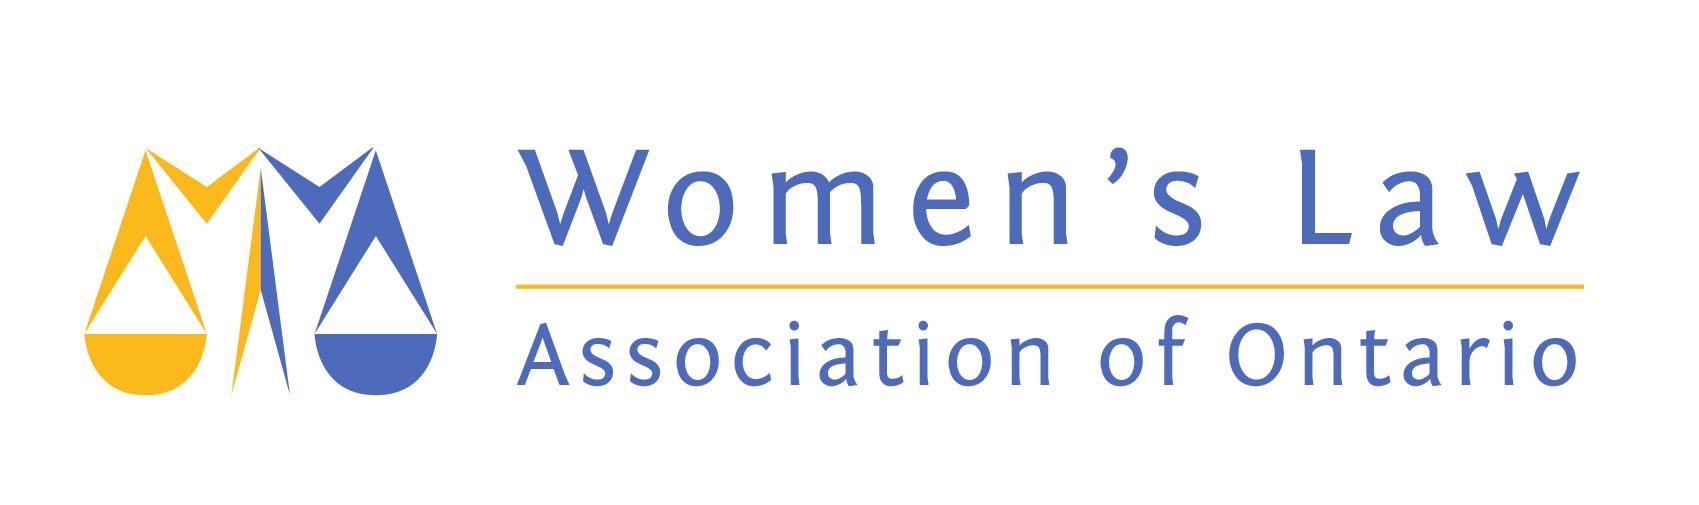 wlao logo